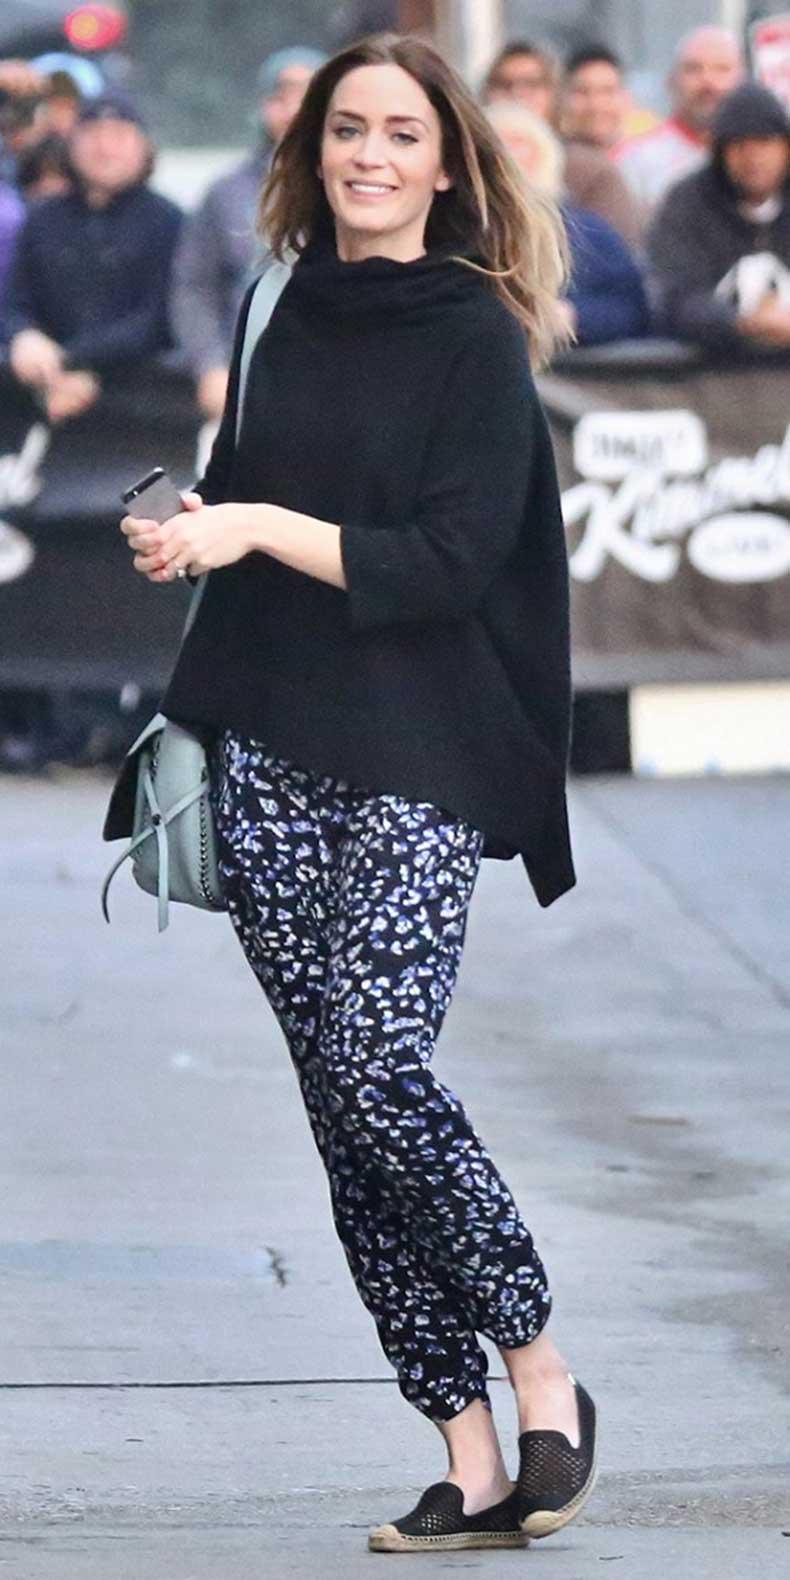 printed-pants-black-poncho-sweater-turtleneck-sweater-oversized-sweater-casual-weekend-emily-blunt-via-splash-via-whowhatwear